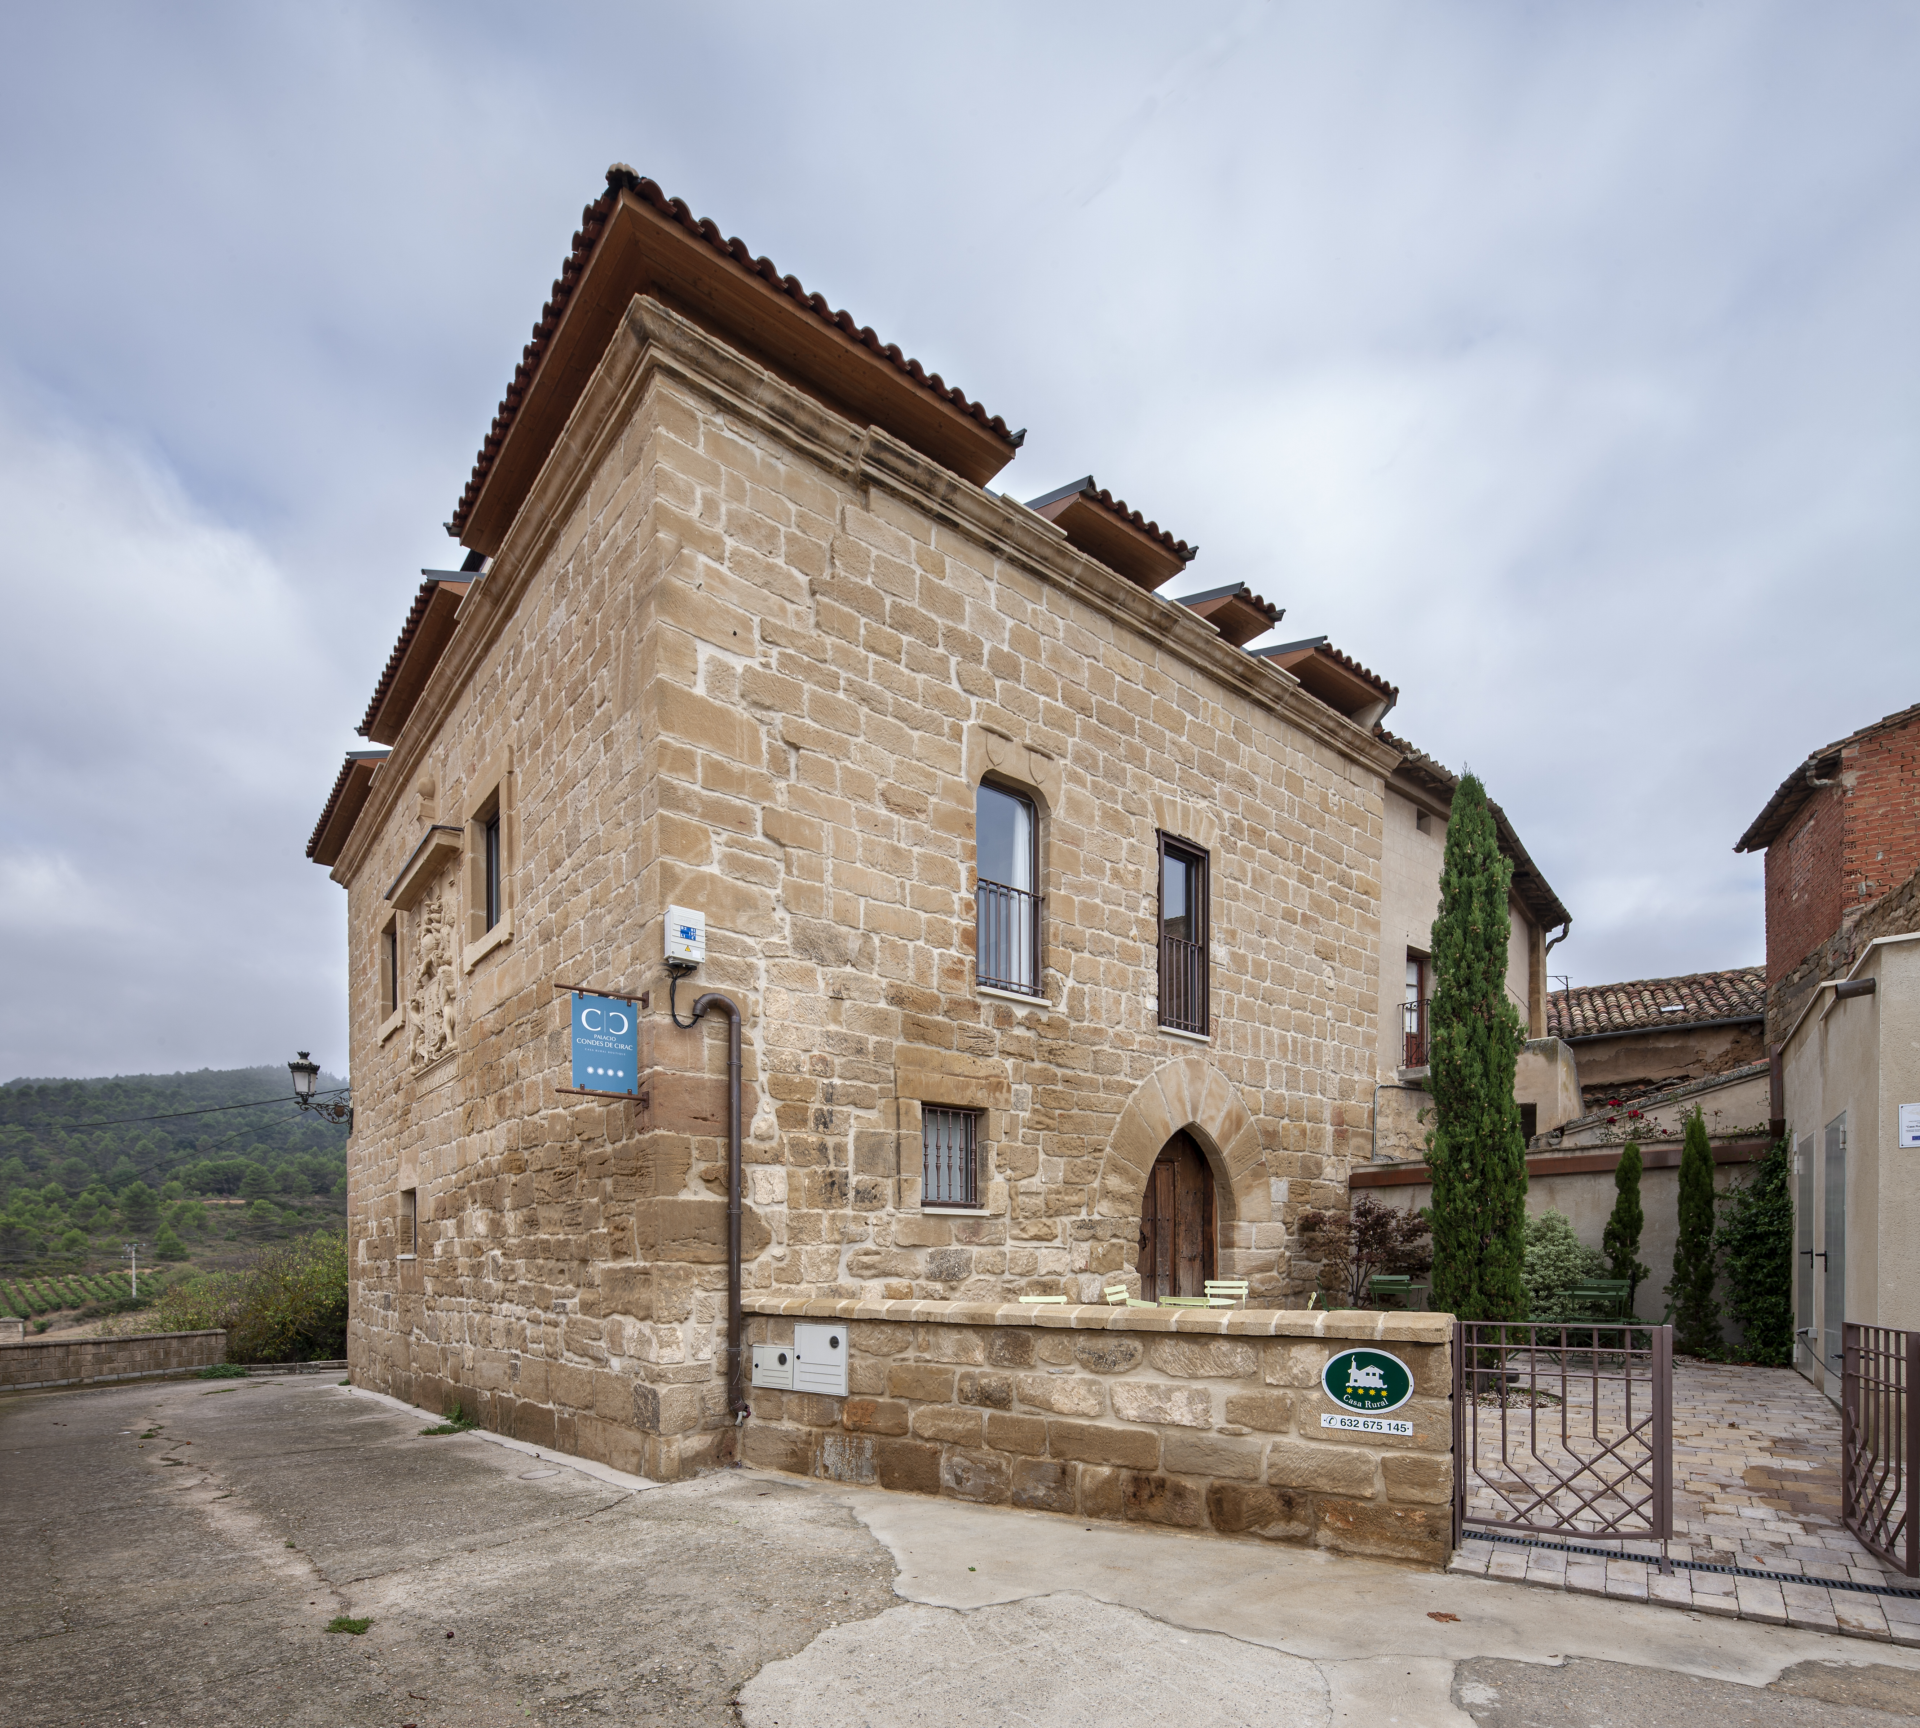 Ferienhaus Palacio Condes de Cirac für 16 Per Besondere Immobilie in Spanien